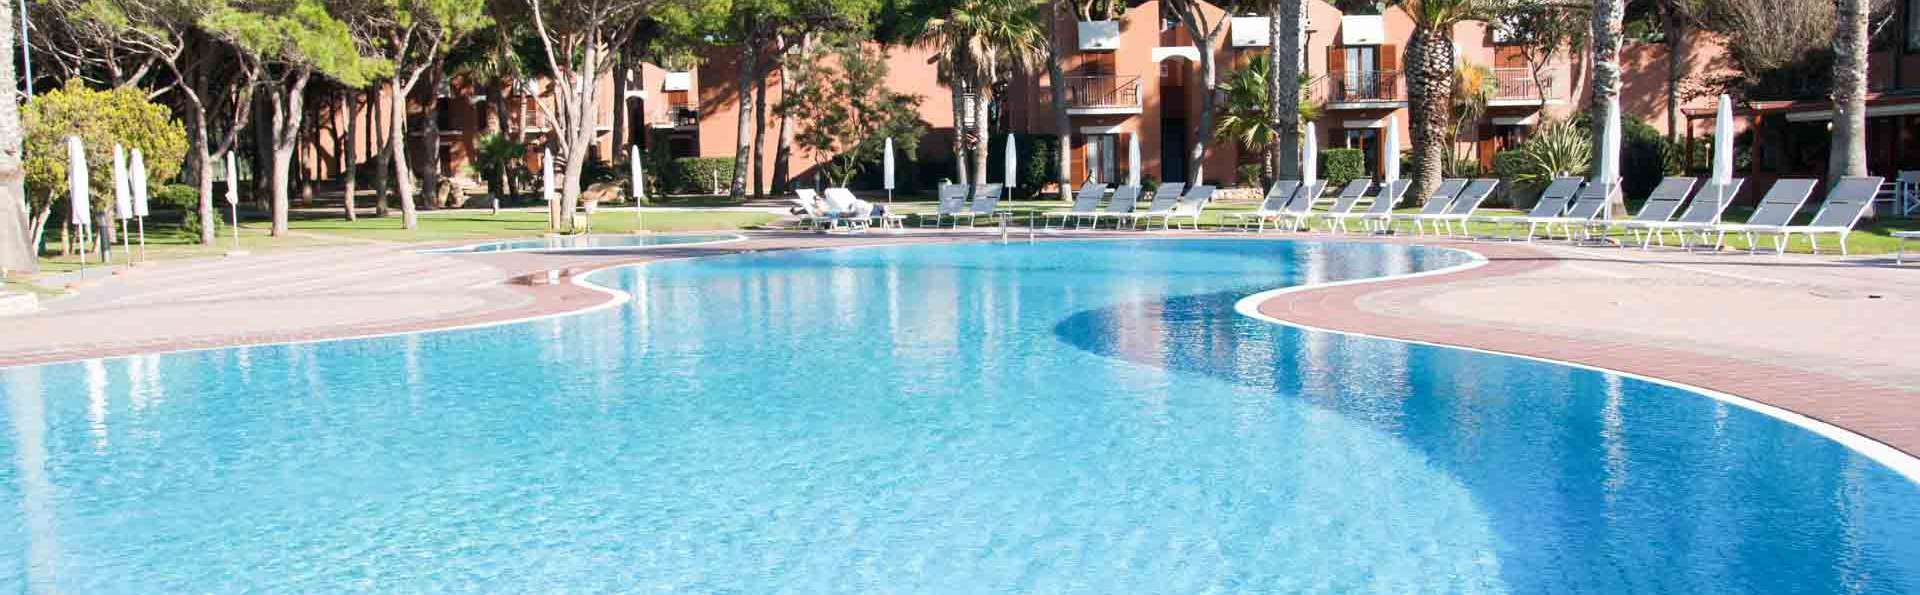 Hotel Corte Rosada (Adults Only) - Edit_POOL2.jpg